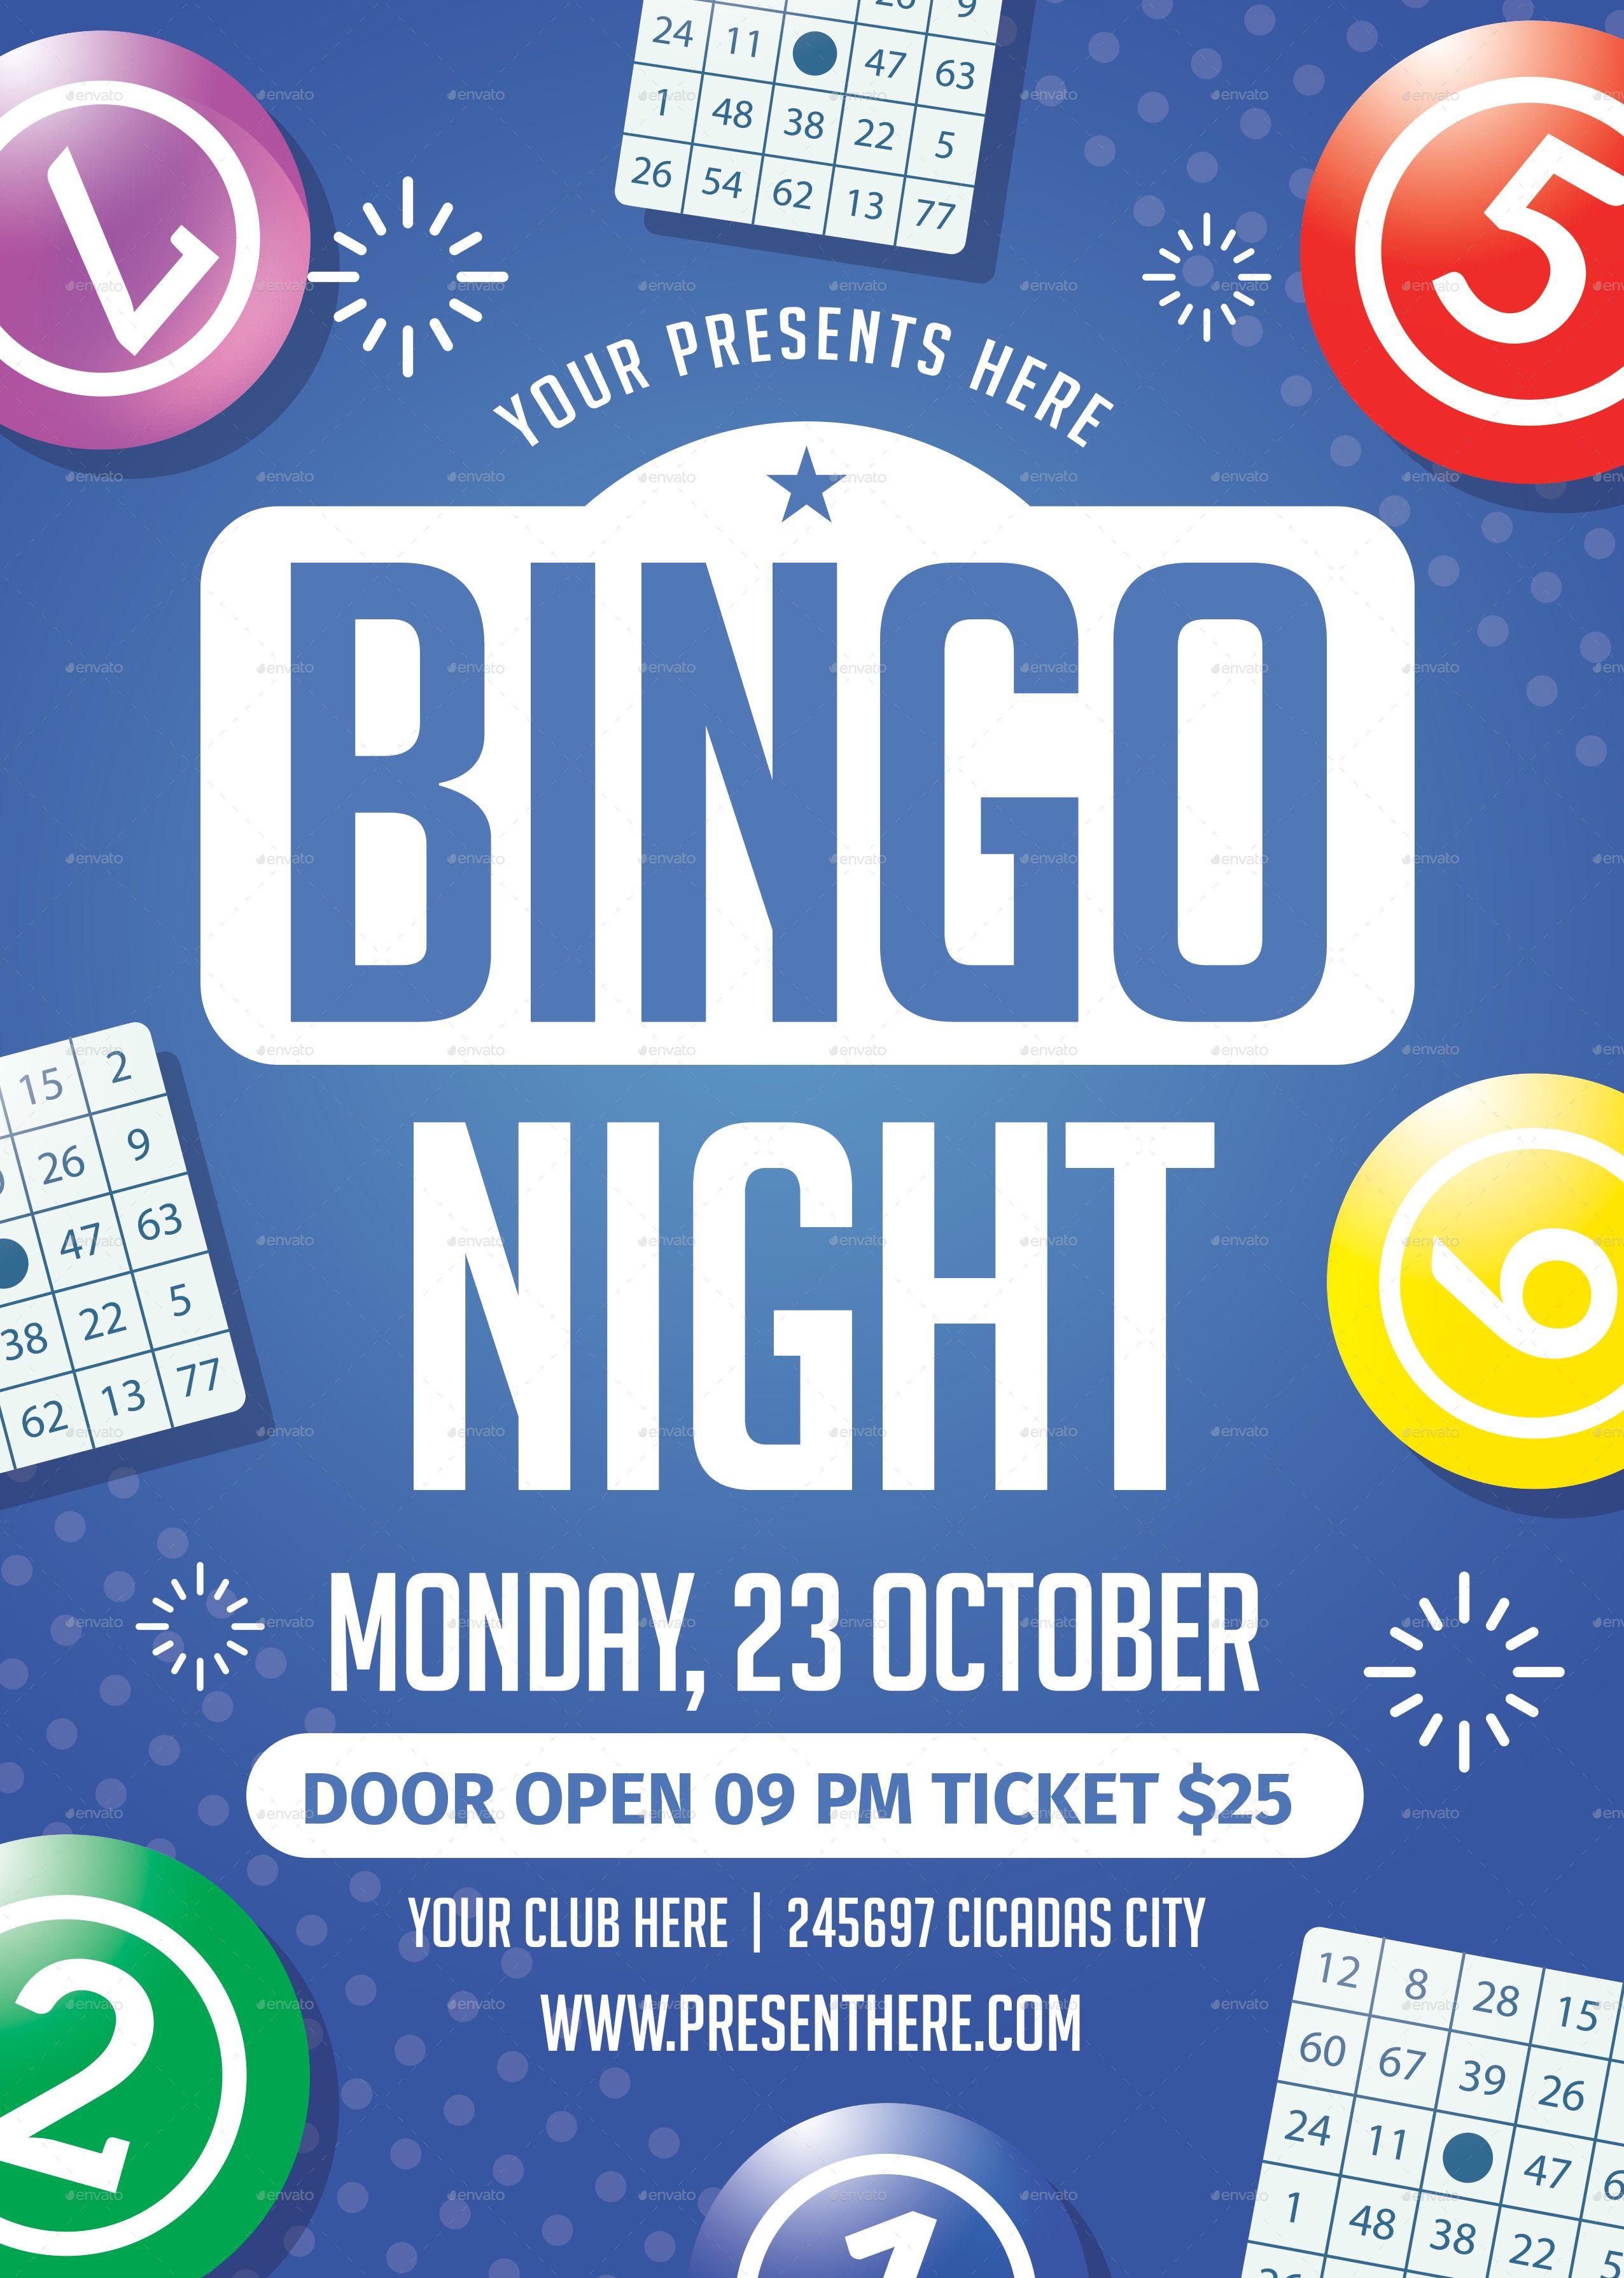 Bingo Night Flyer Bingo Night Fundraiser Flyer Trivia Night Flyer